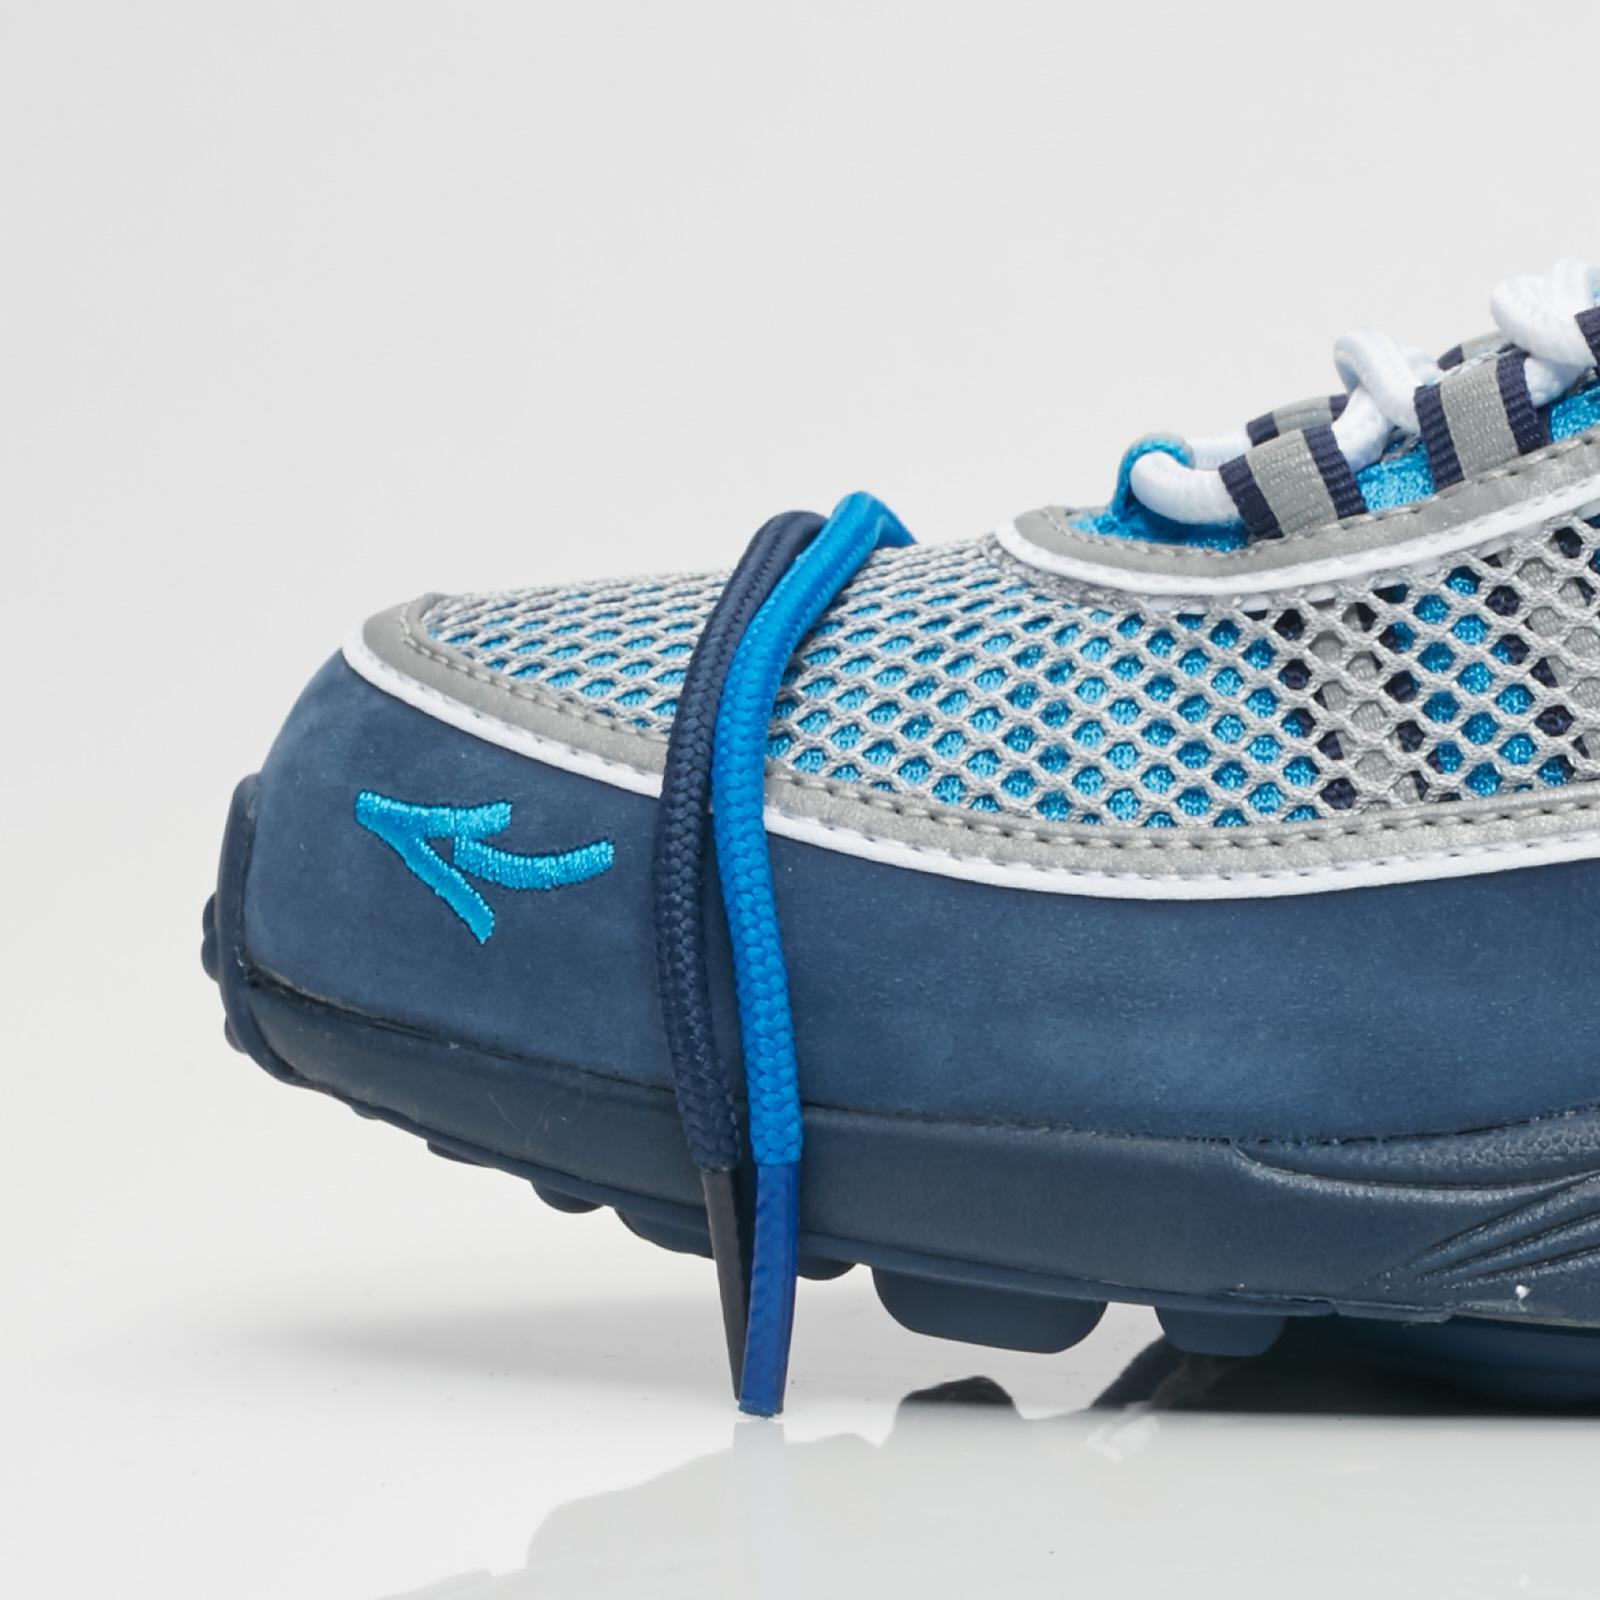 new product 226ab da5c2 ... NikeLab Air Zoom Spiridon 16 STASH